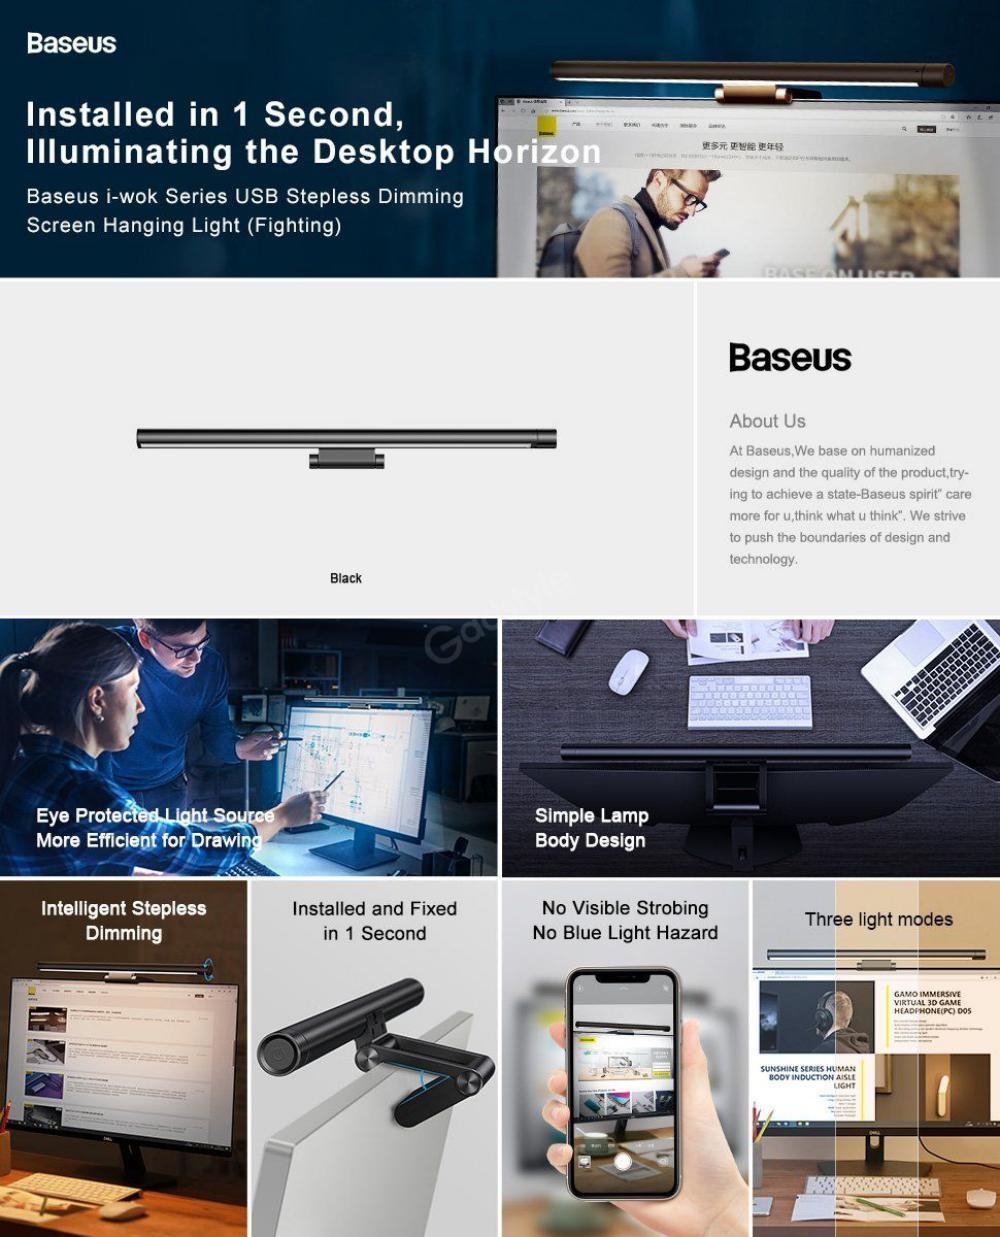 Baseus Screen Hanging Light Fighting Pro (3)